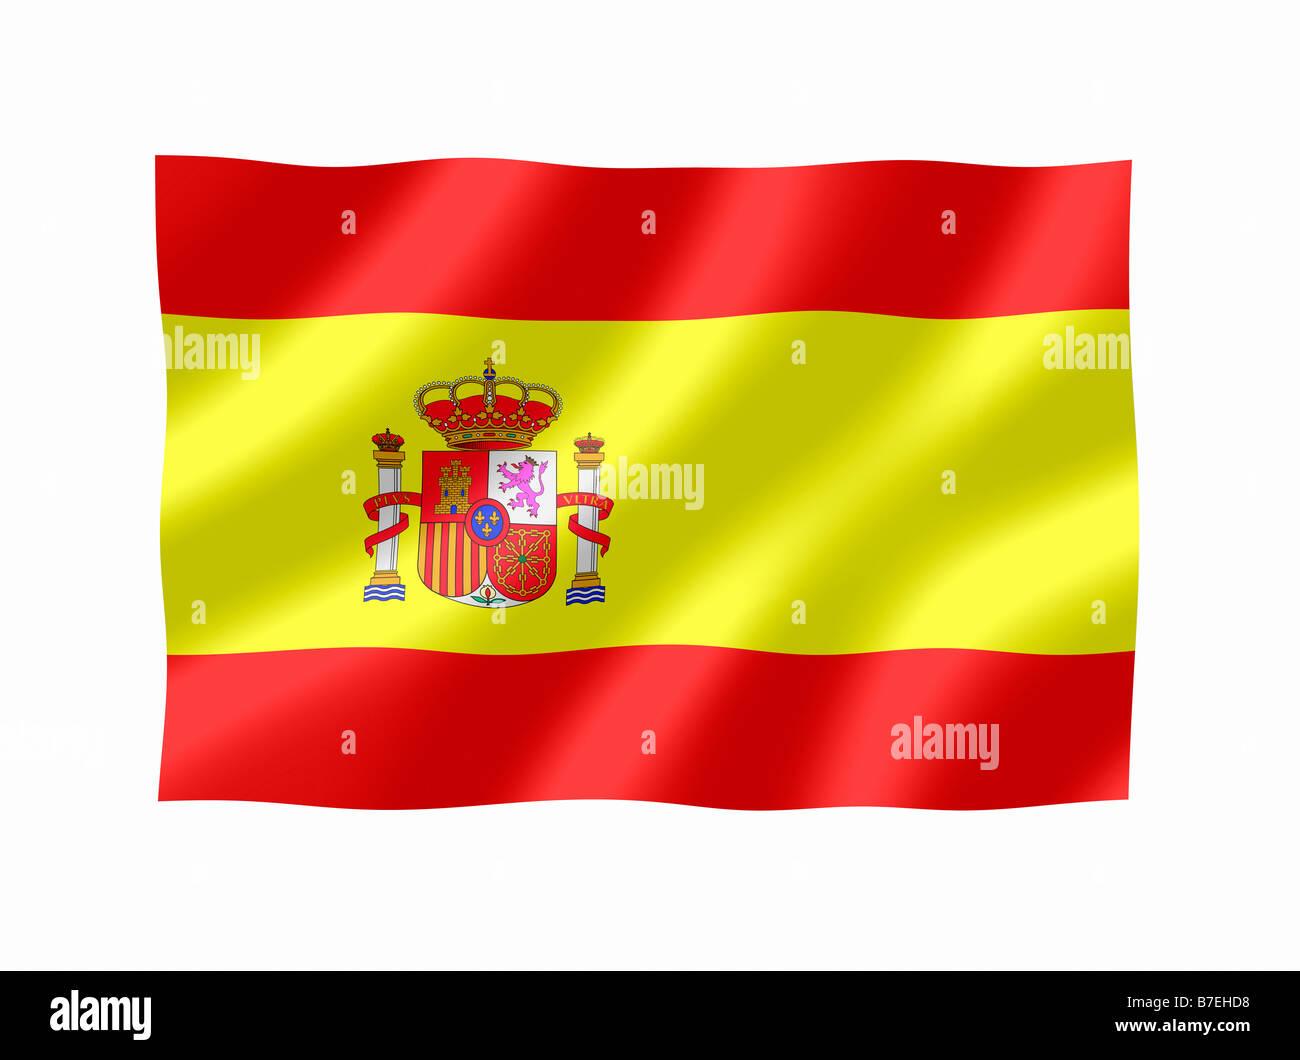 Spain Spanish National Flag Stock Photo: 21833988 - Alamy